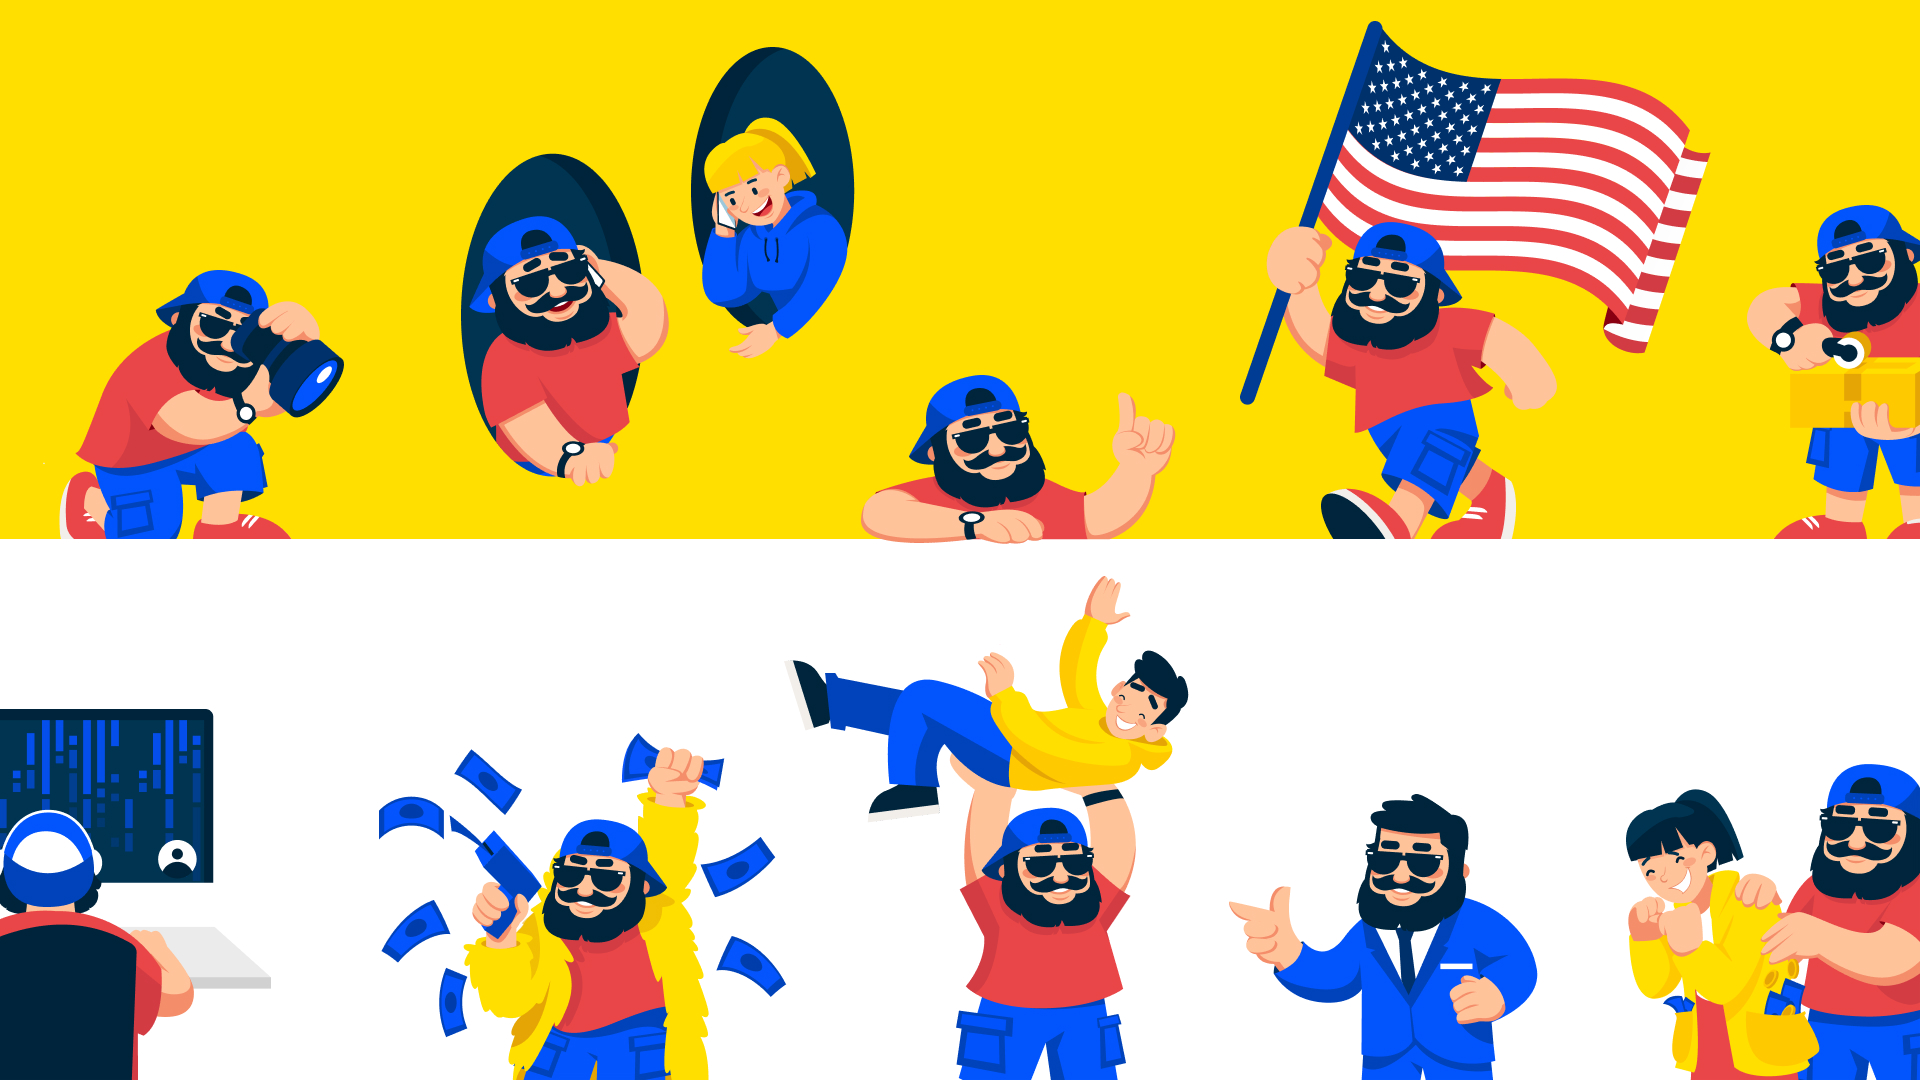 Shipdaddy design mascots